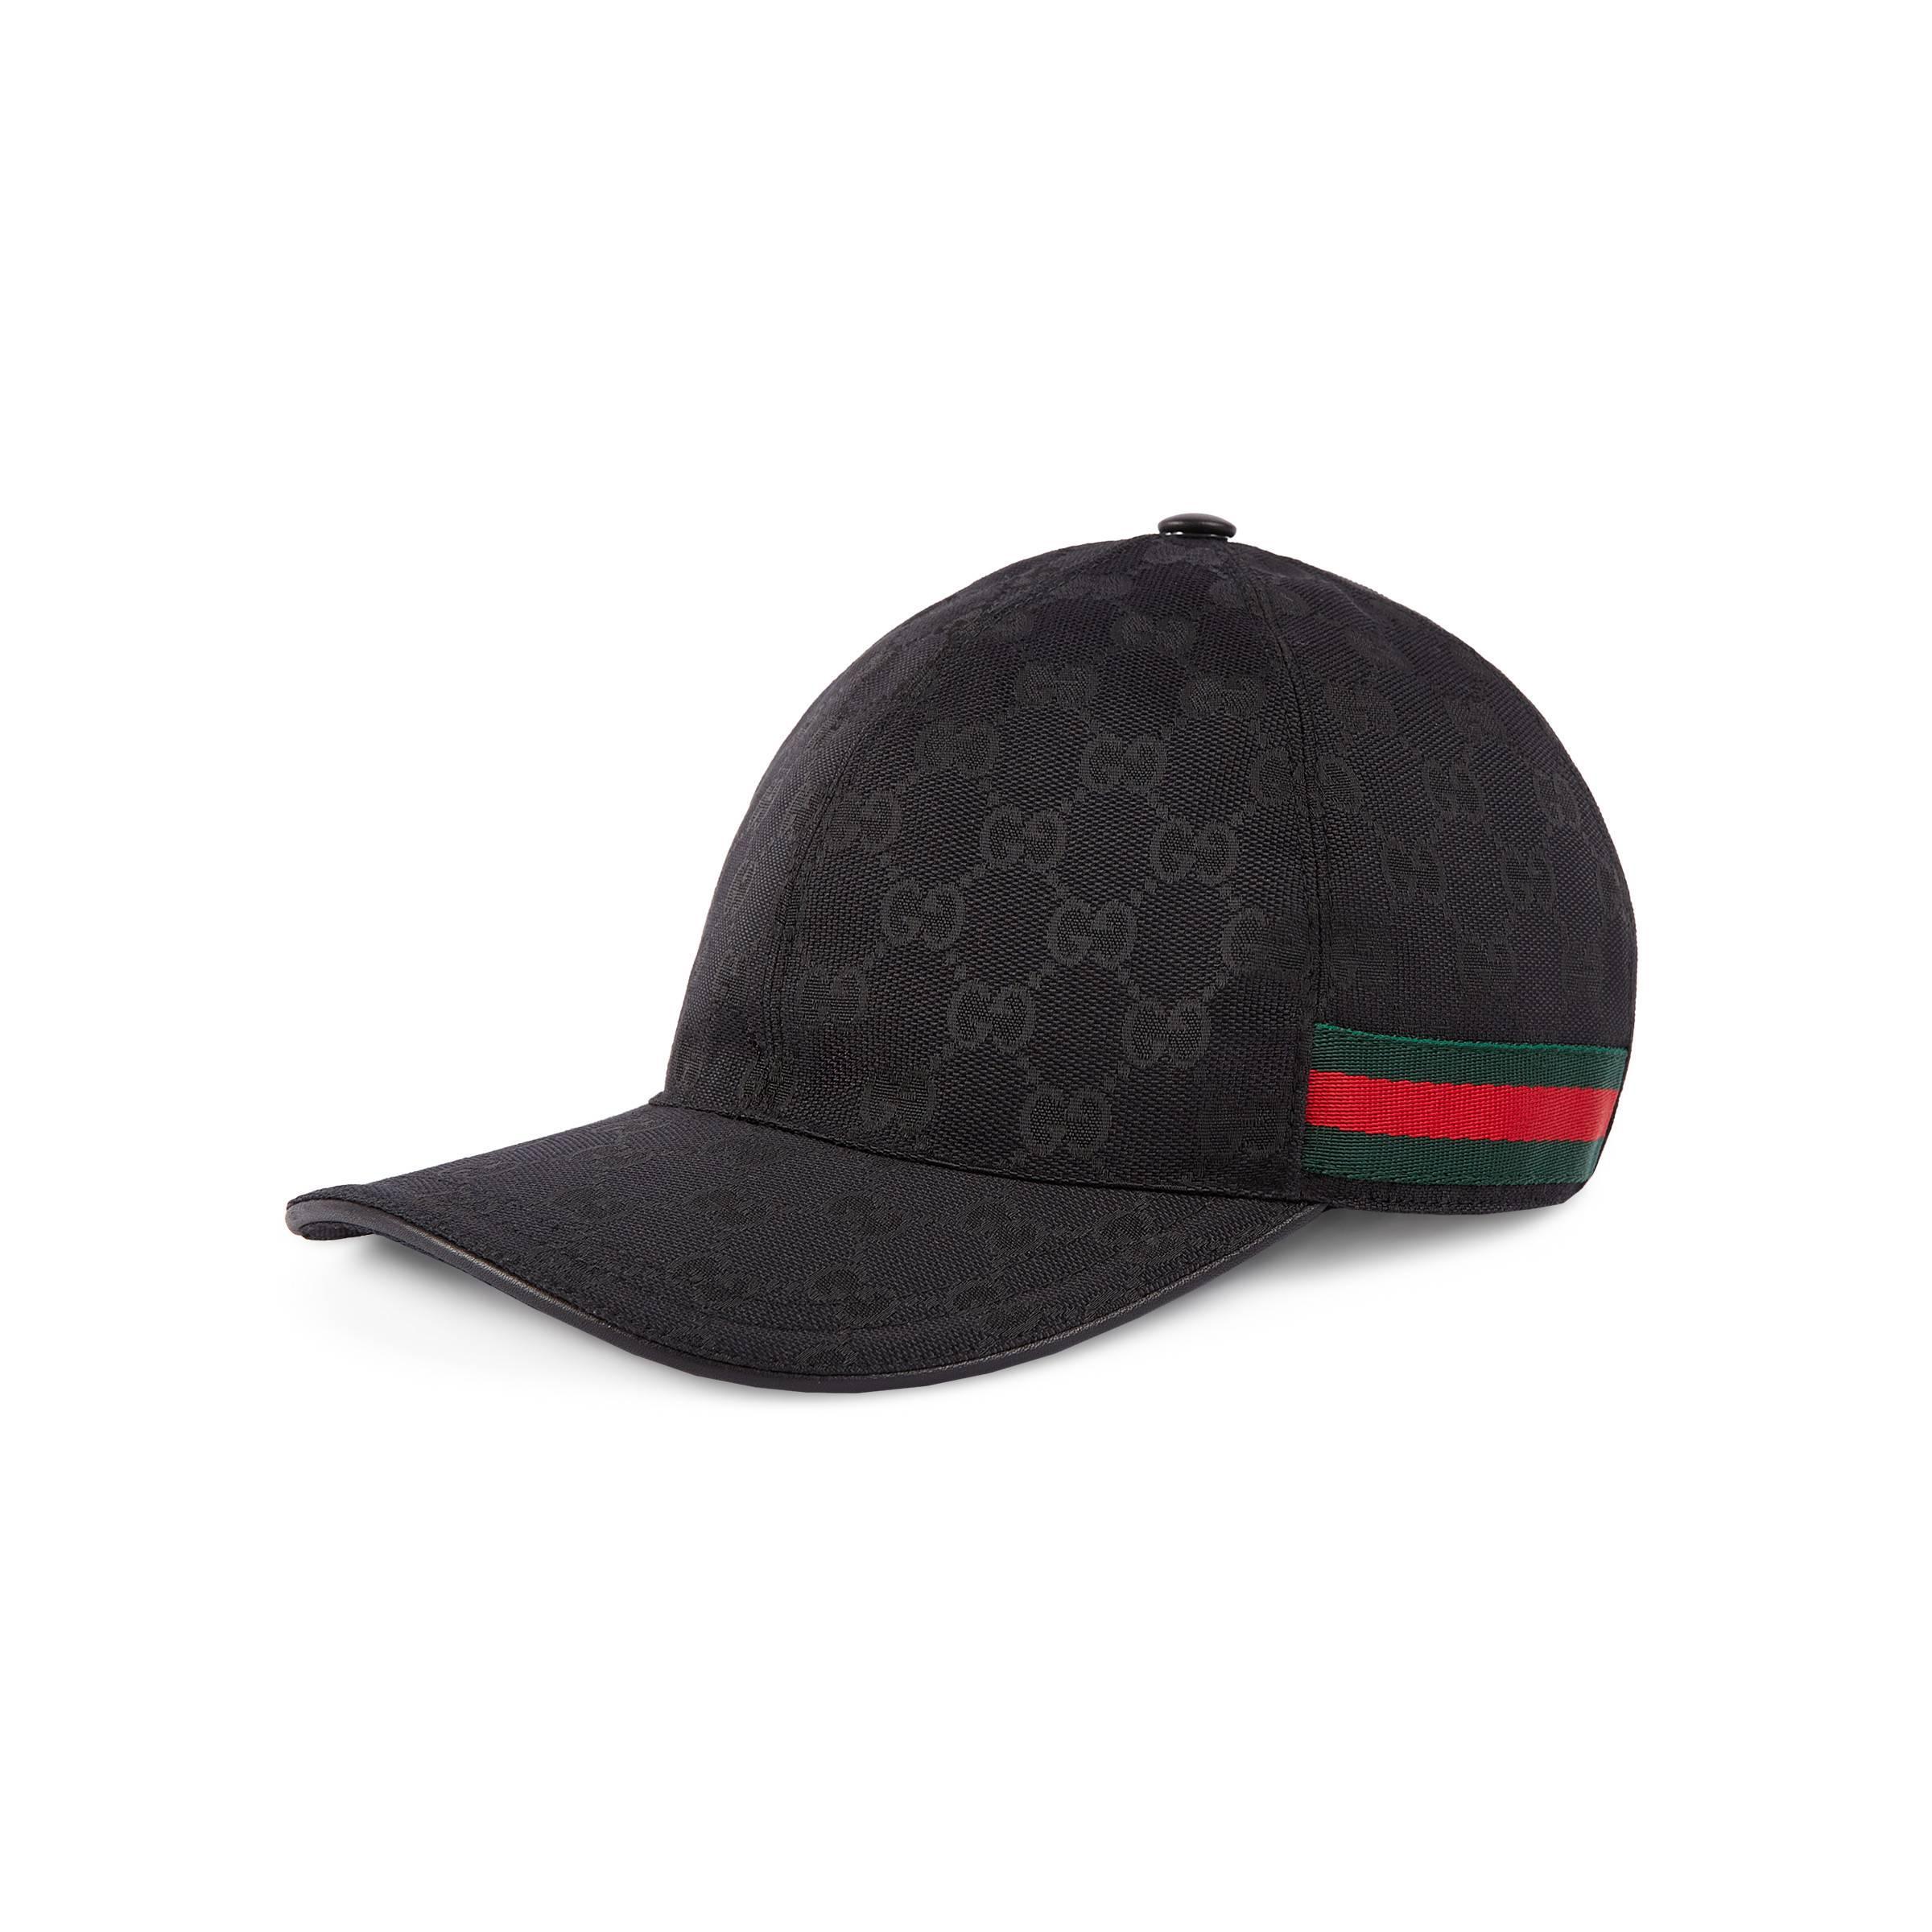 c608421b2f5 Gucci Original GG Canvas Baseball Hat in Black for Men - Save 43% - Lyst